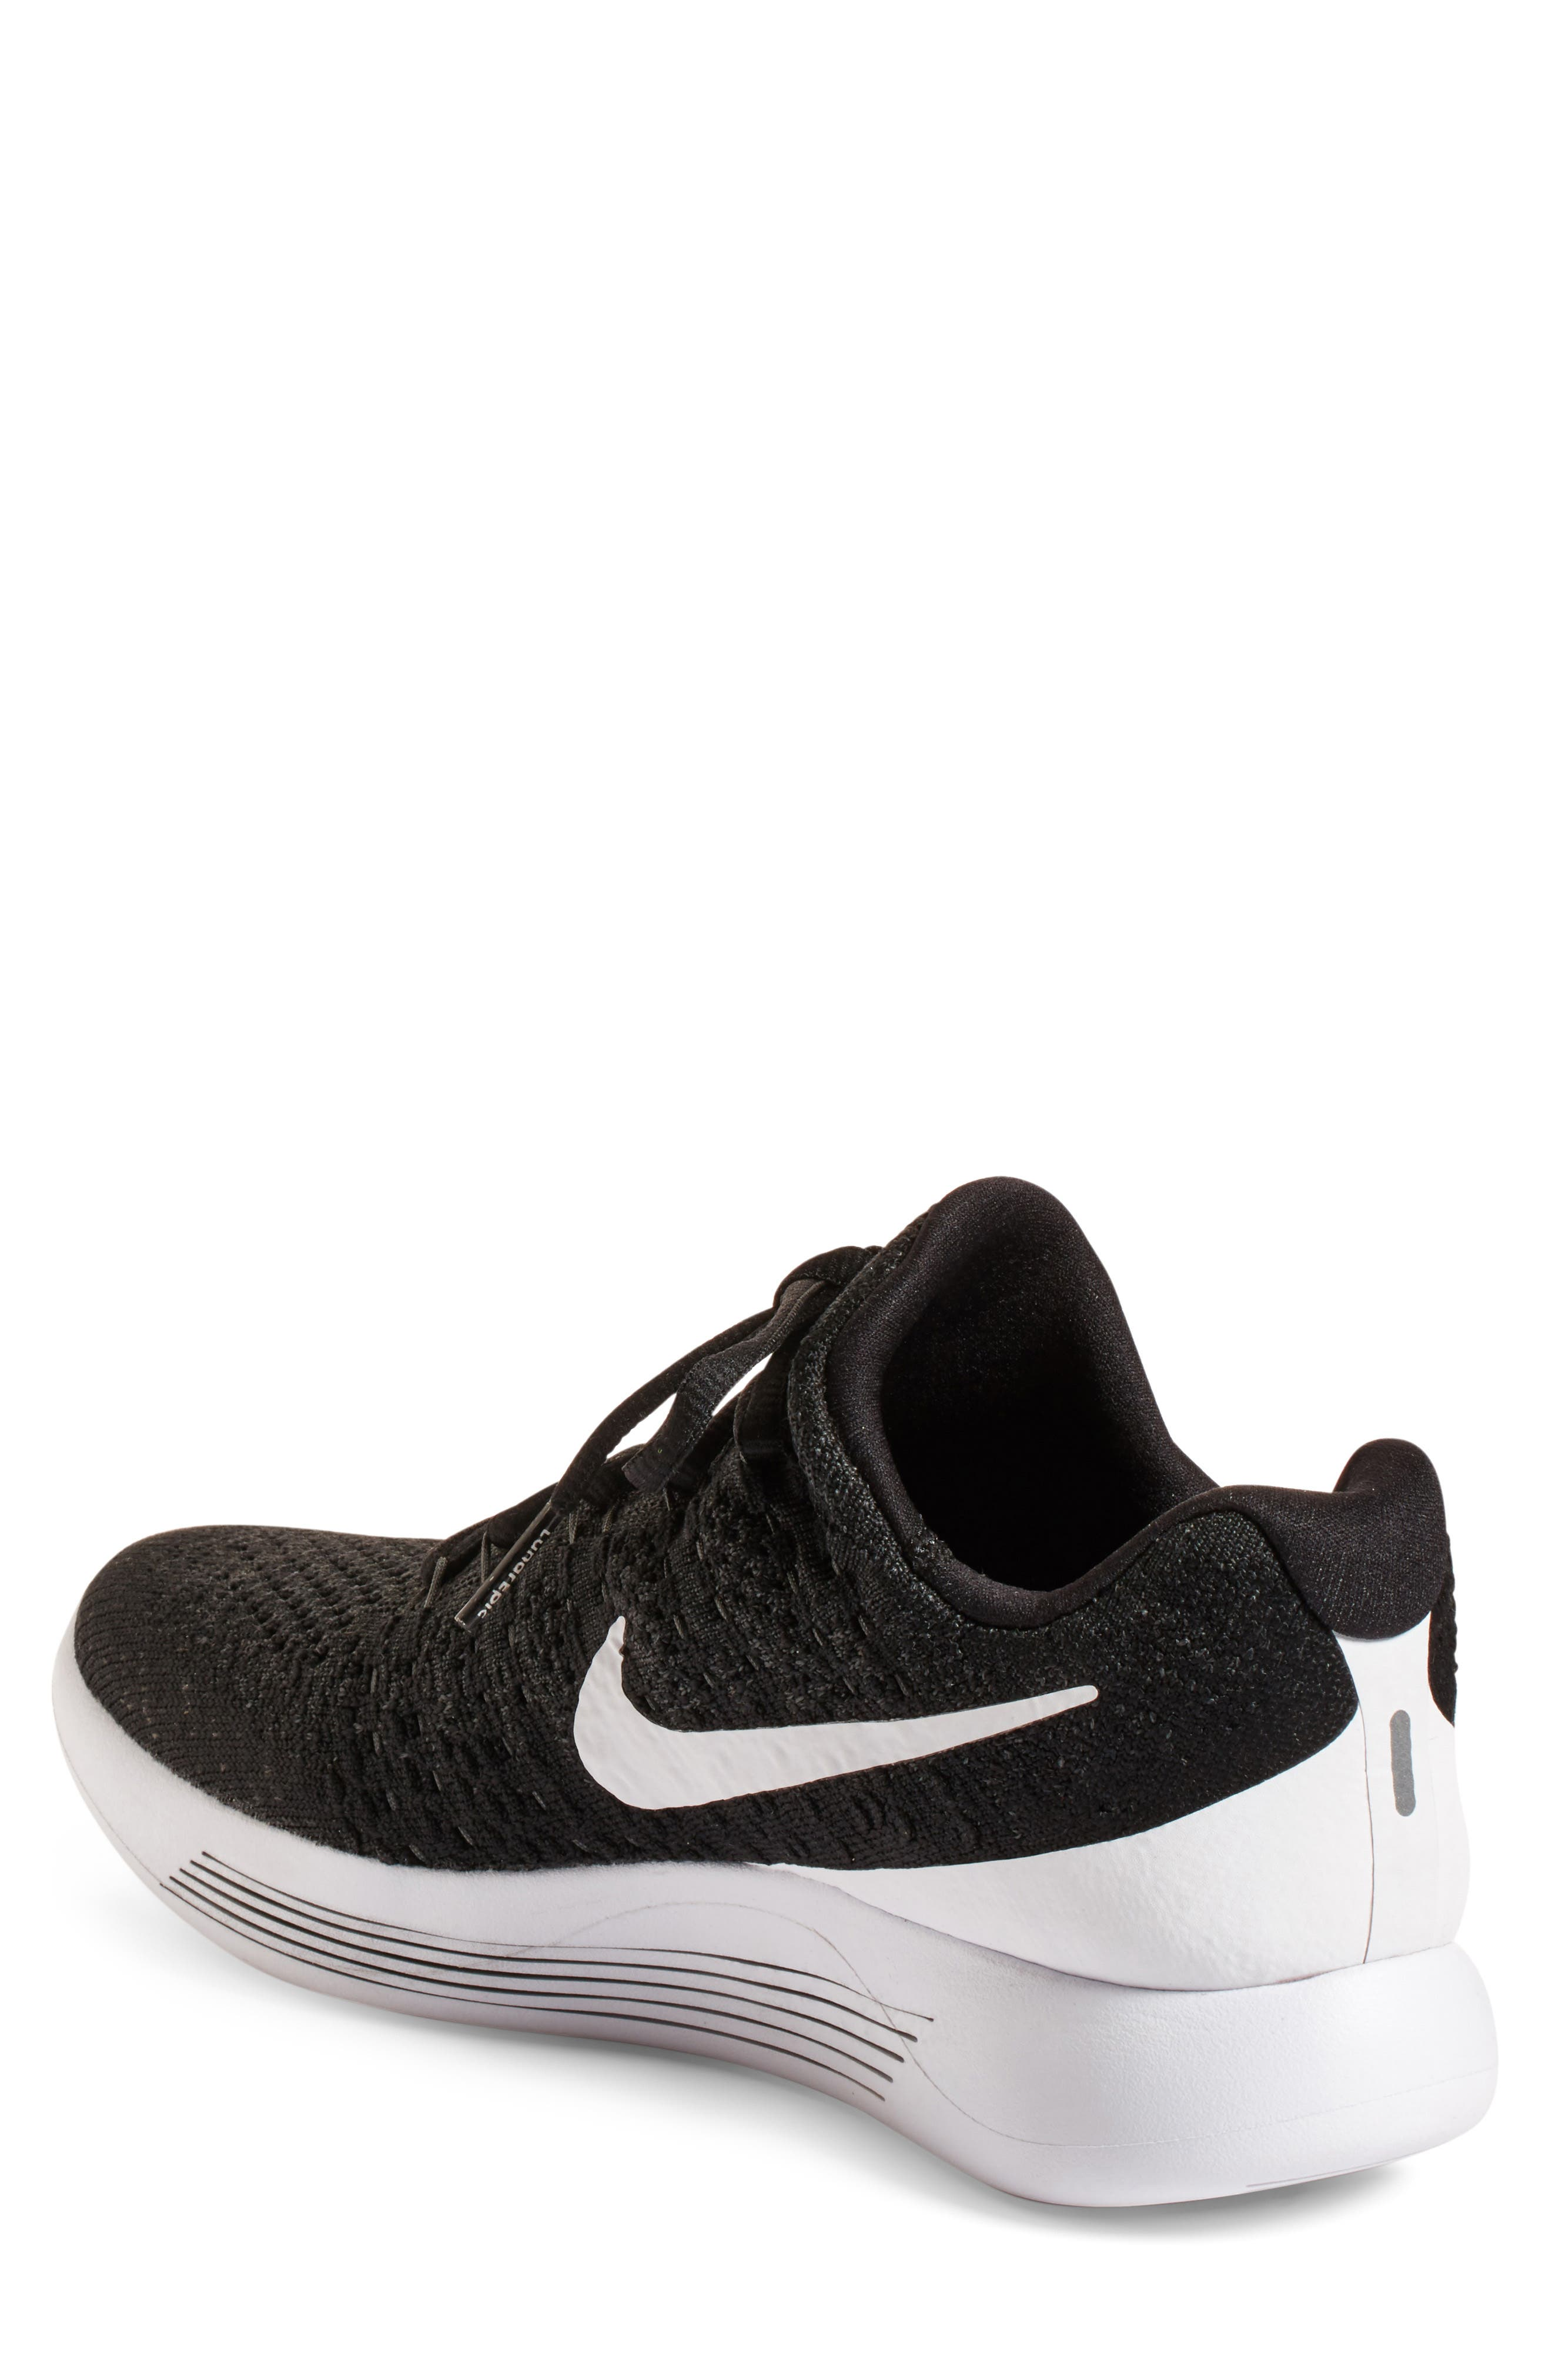 Flyknit 2 LunarEpic Running Shoe,                             Alternate thumbnail 2, color,                             Black/ White/ Anthracite